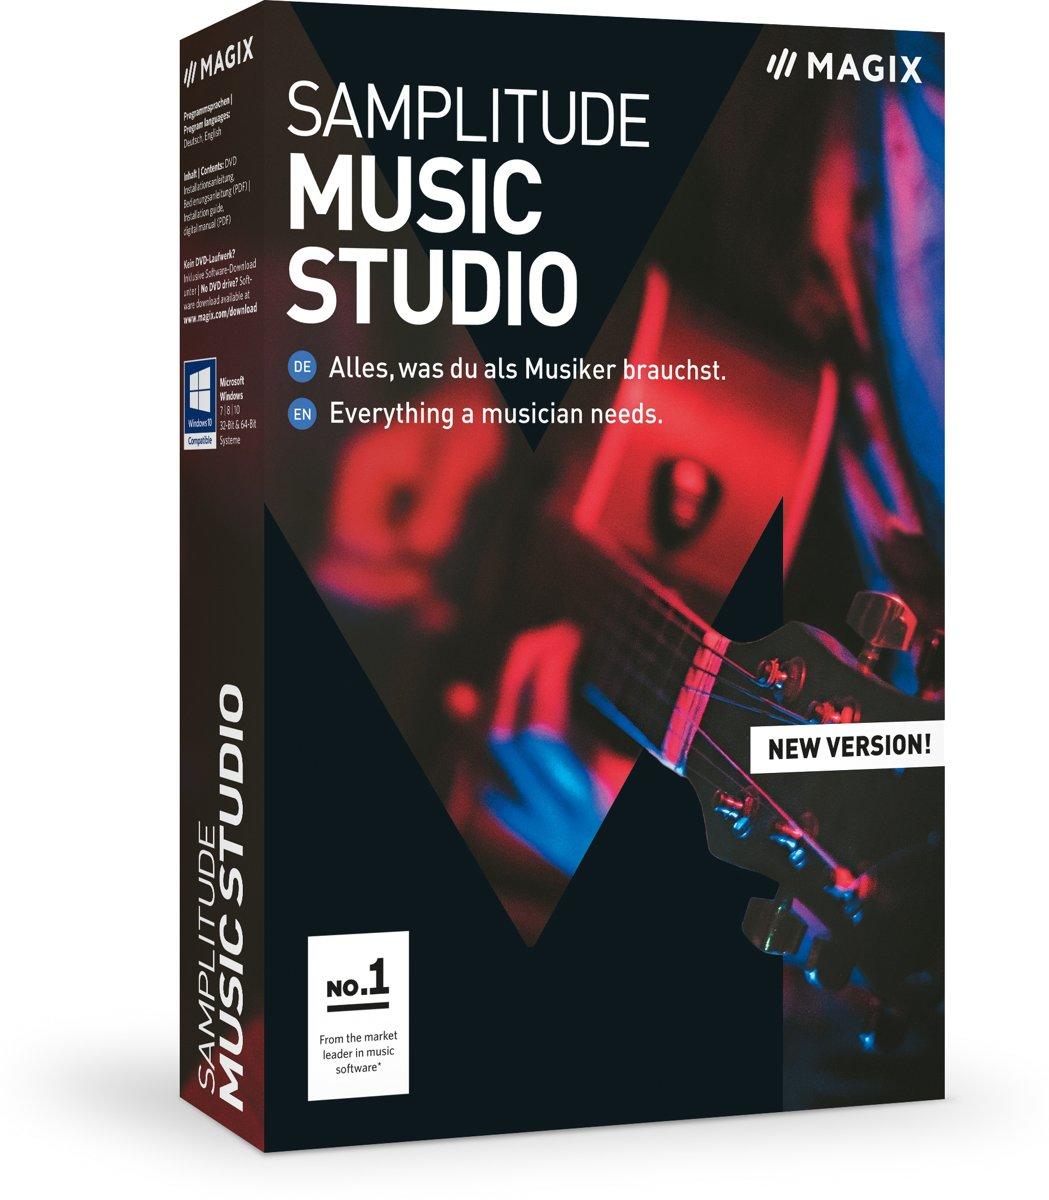 Samplitude Music Studio kopen